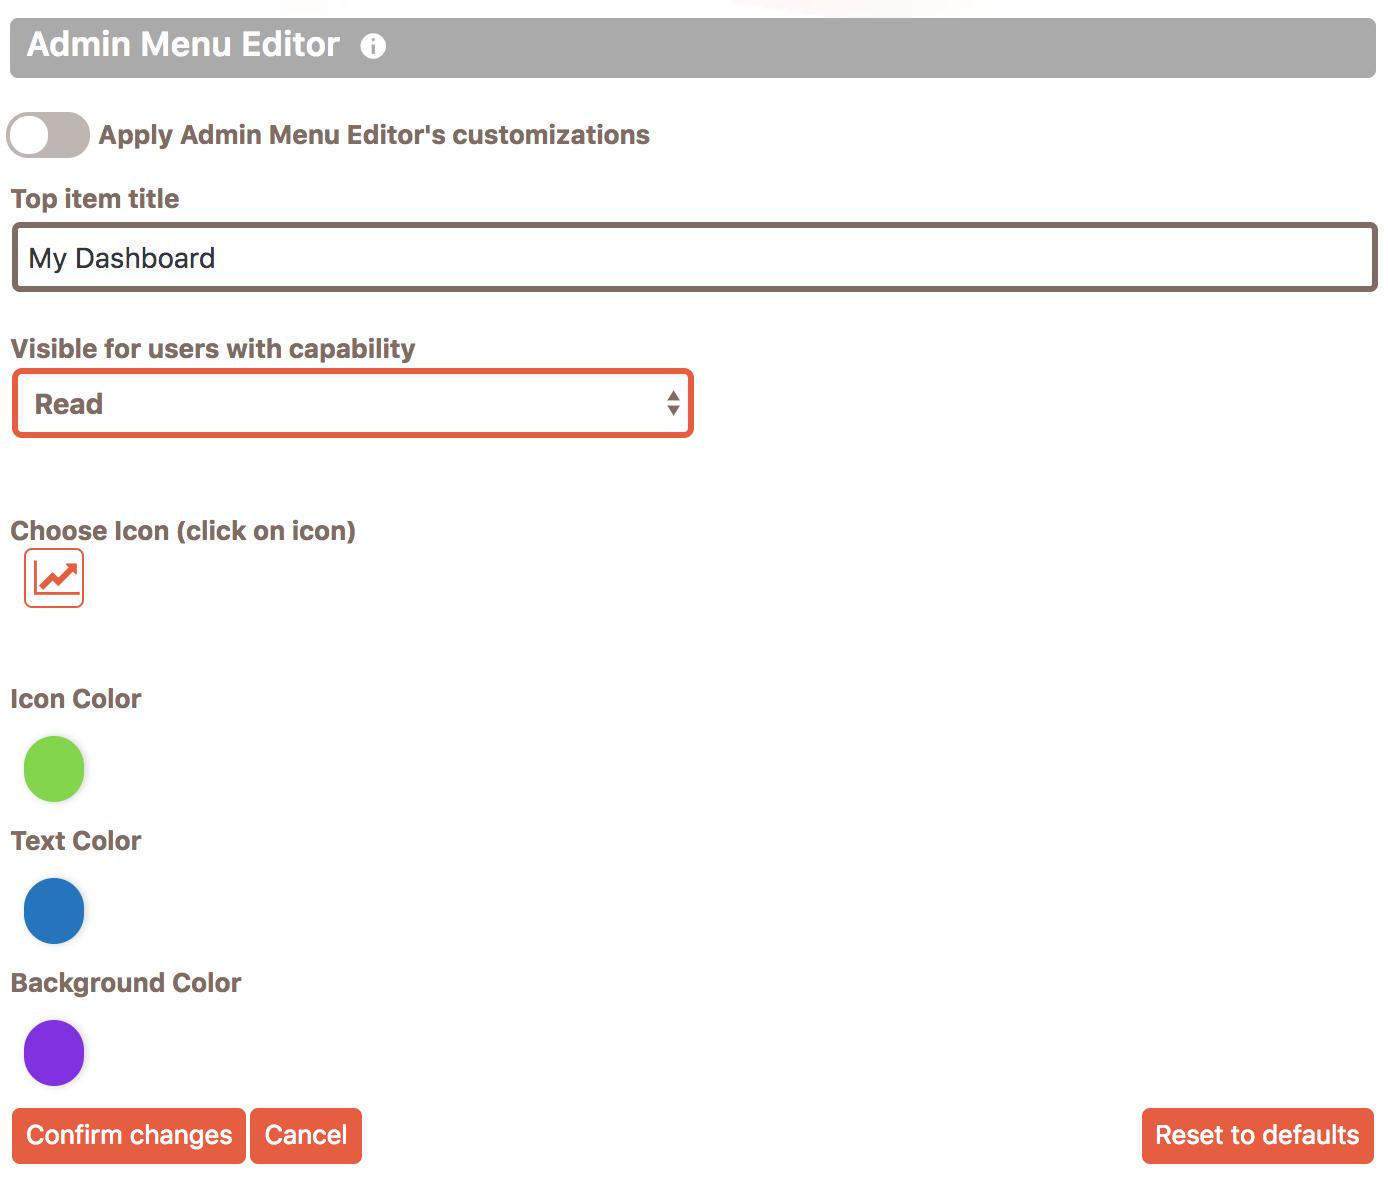 Editing form of a specific top menu item in Cusmin Admin Menu Editor